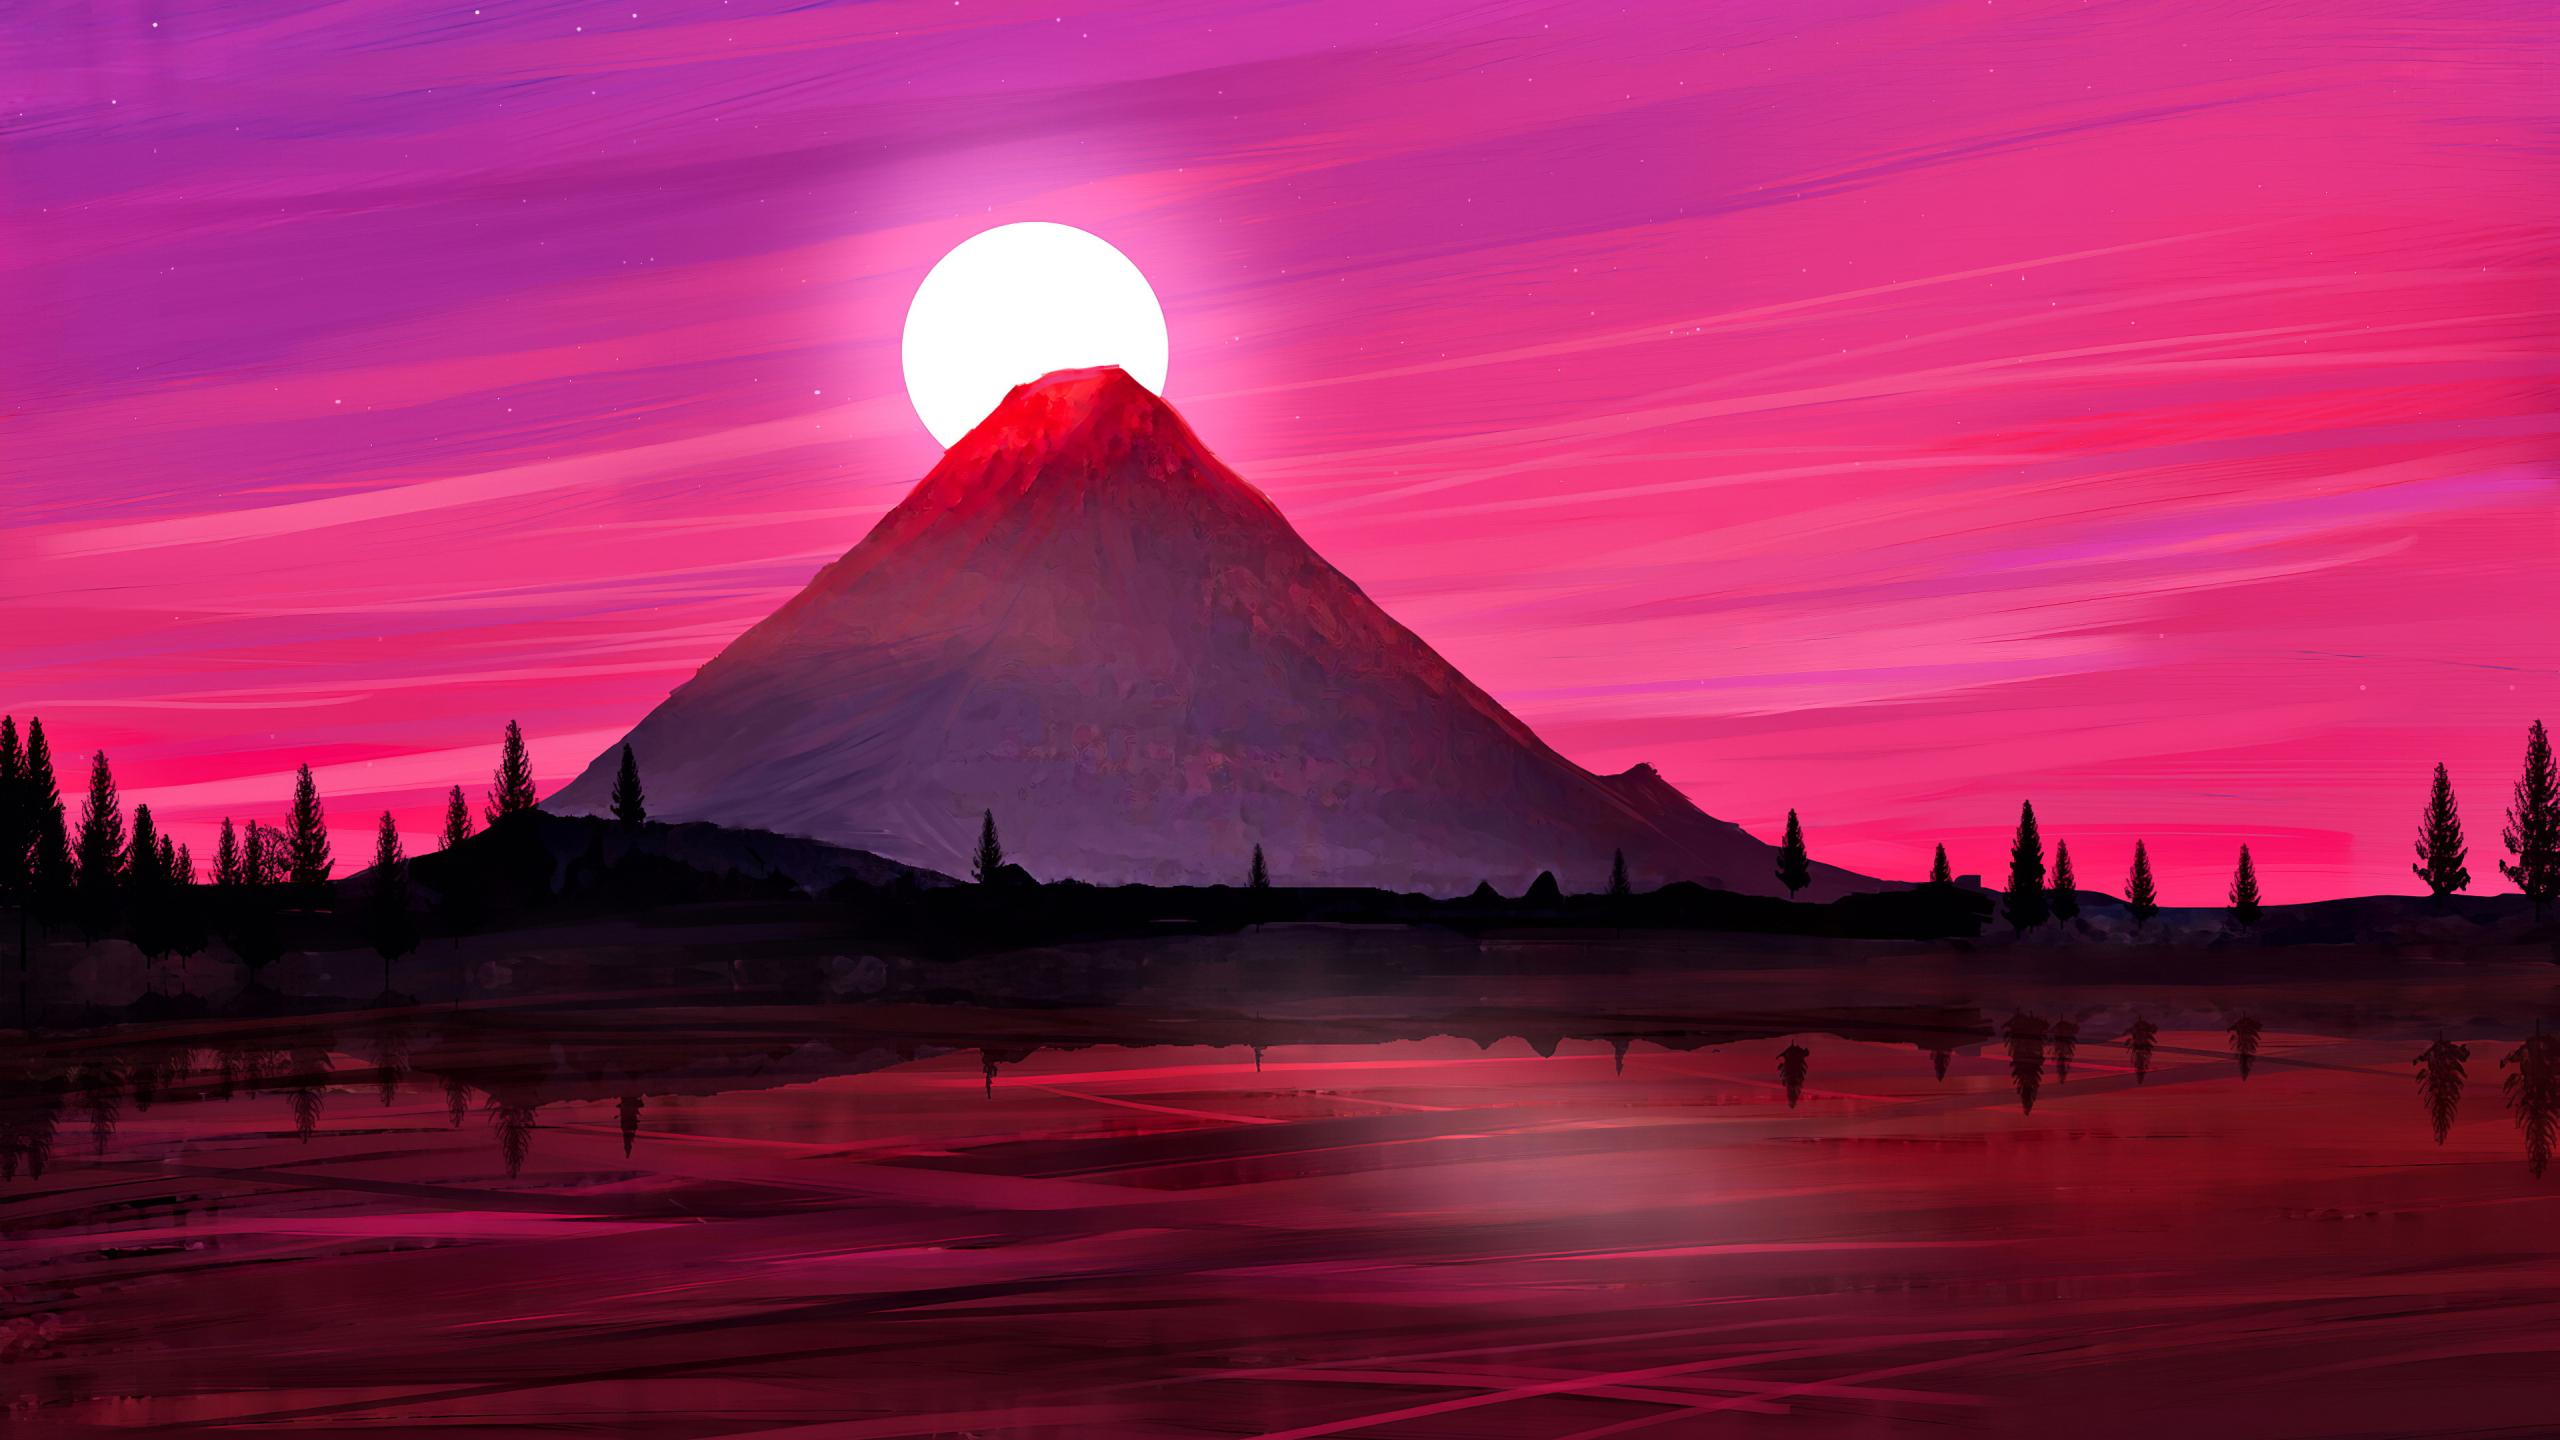 Download 2560x1440 Wallpaper Japan Mountain Silhouette Minimal Art Dual Wide Widescreen 16 9 Widescreen 2560x1440 Hd Image Background 24045